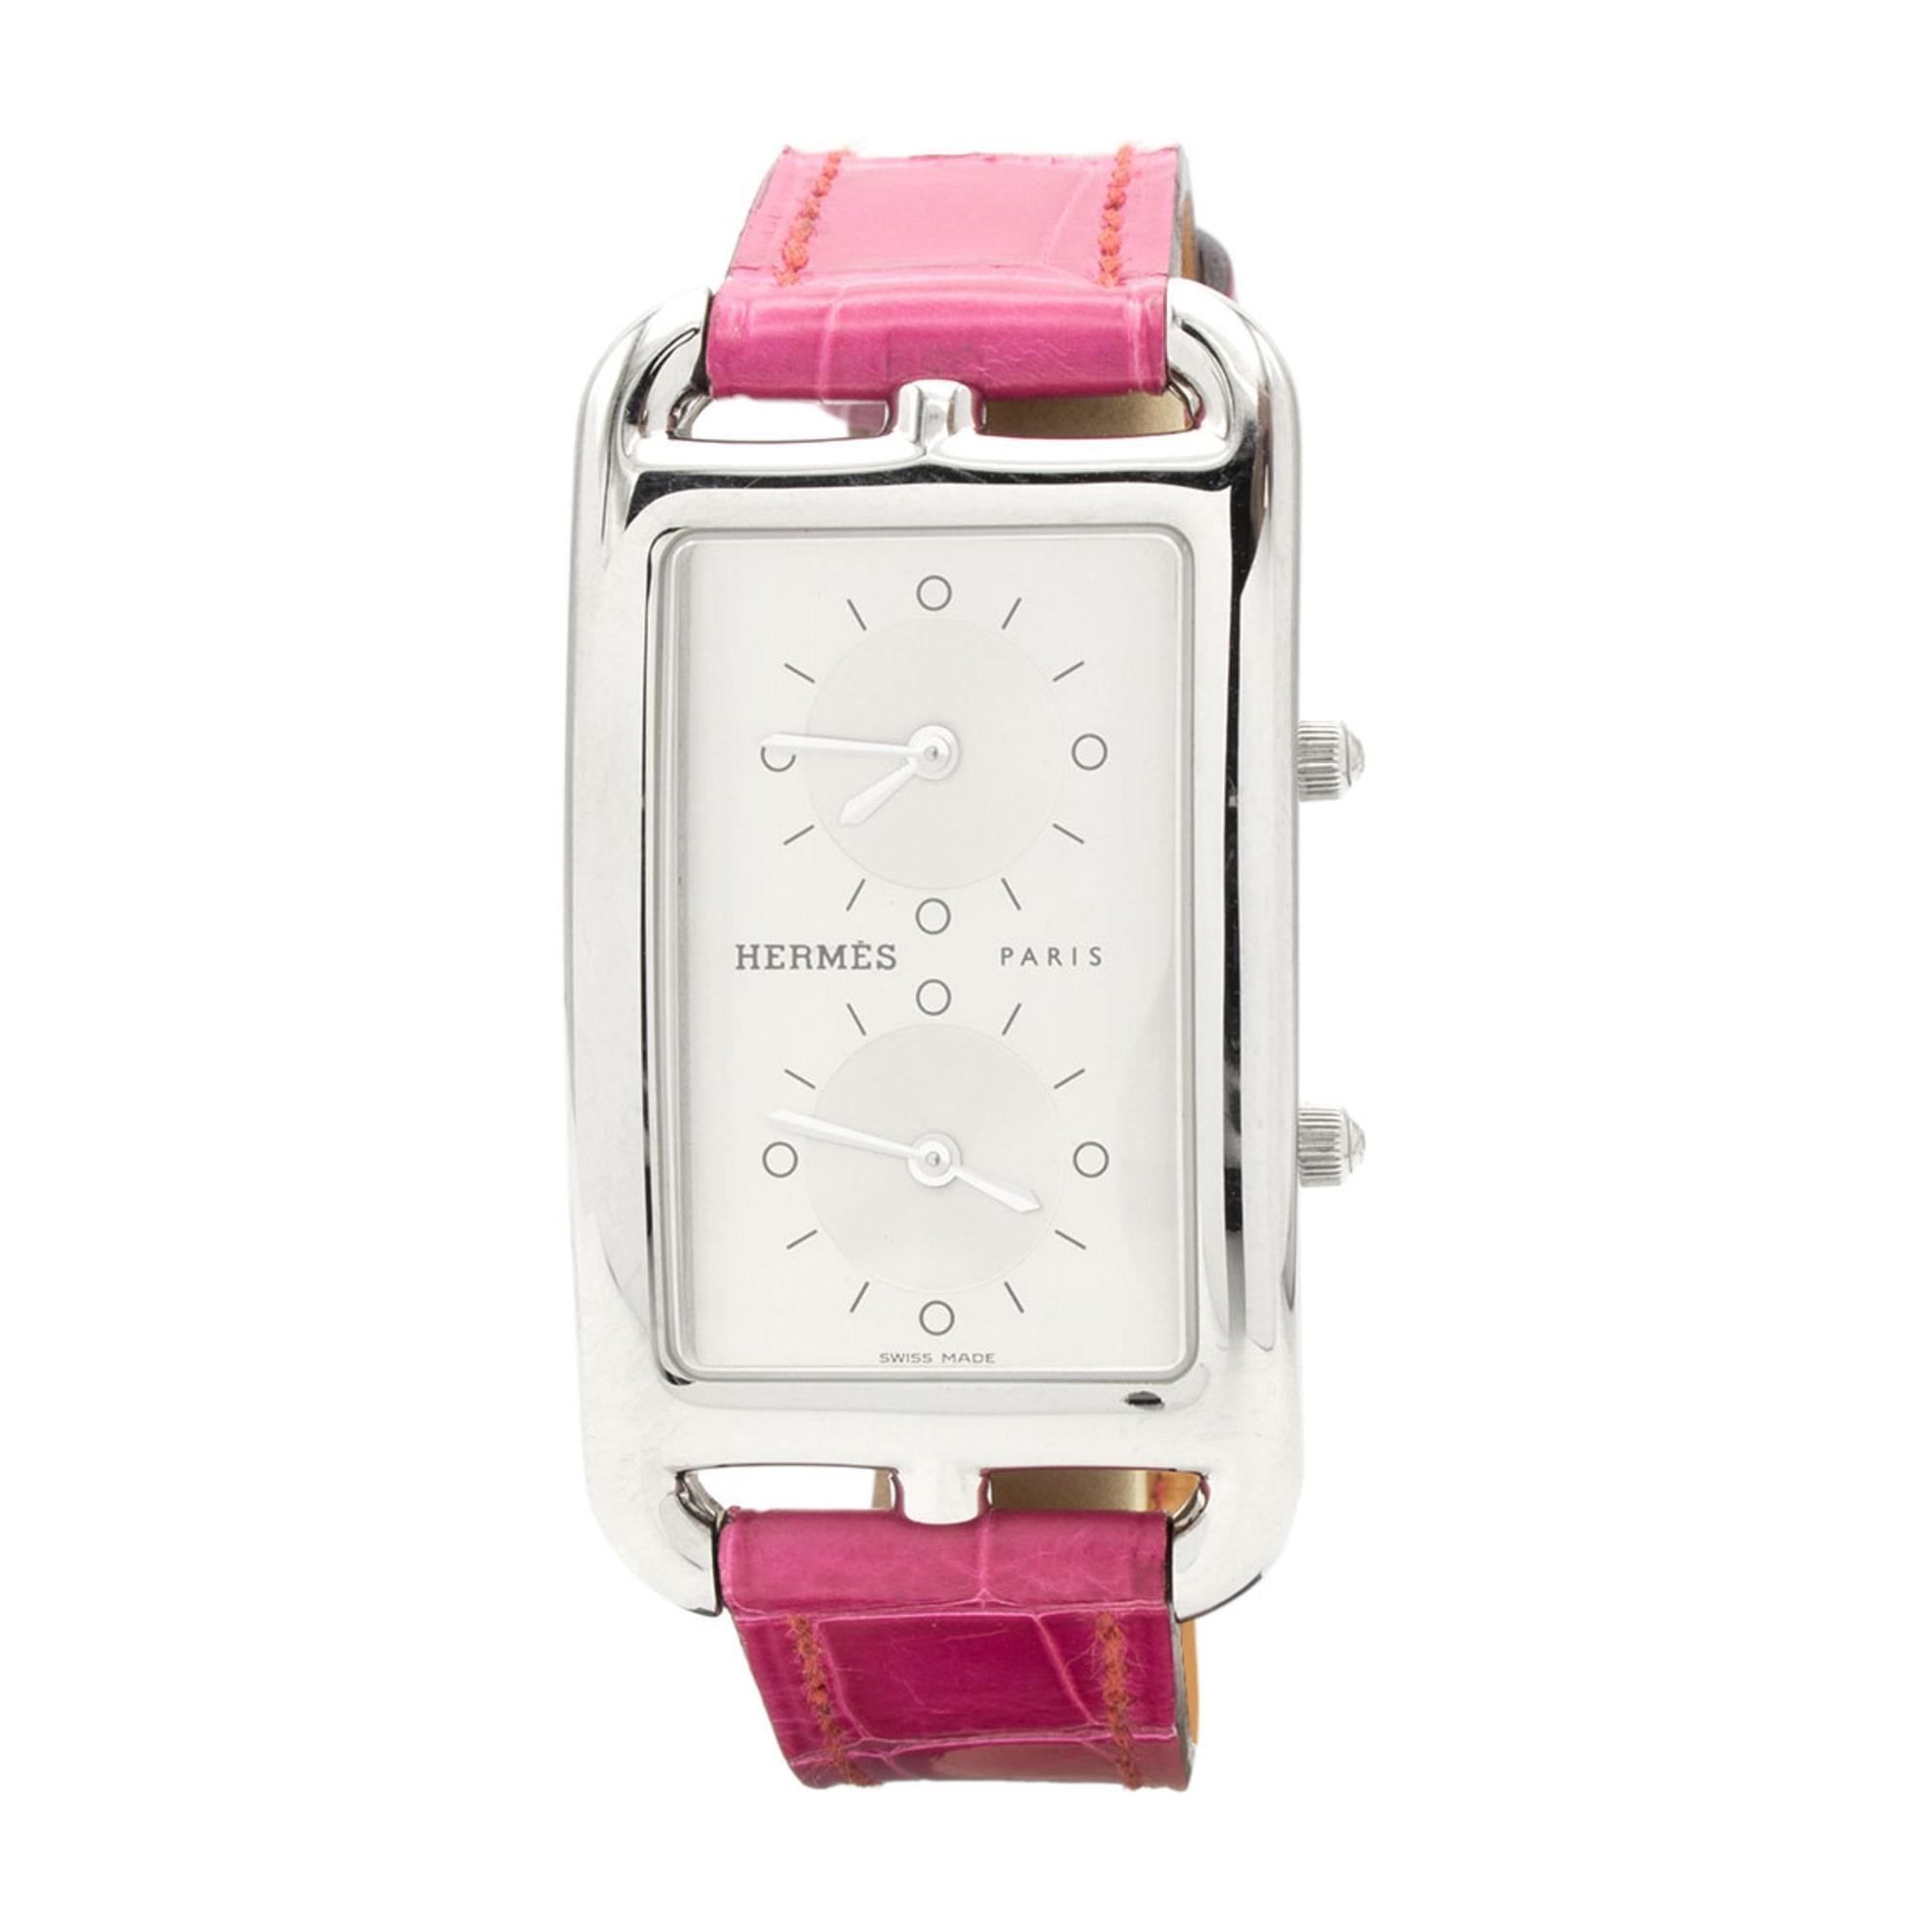 Wrist Watch HERMÈS Cape Cod Pink, fuchsia, light pink